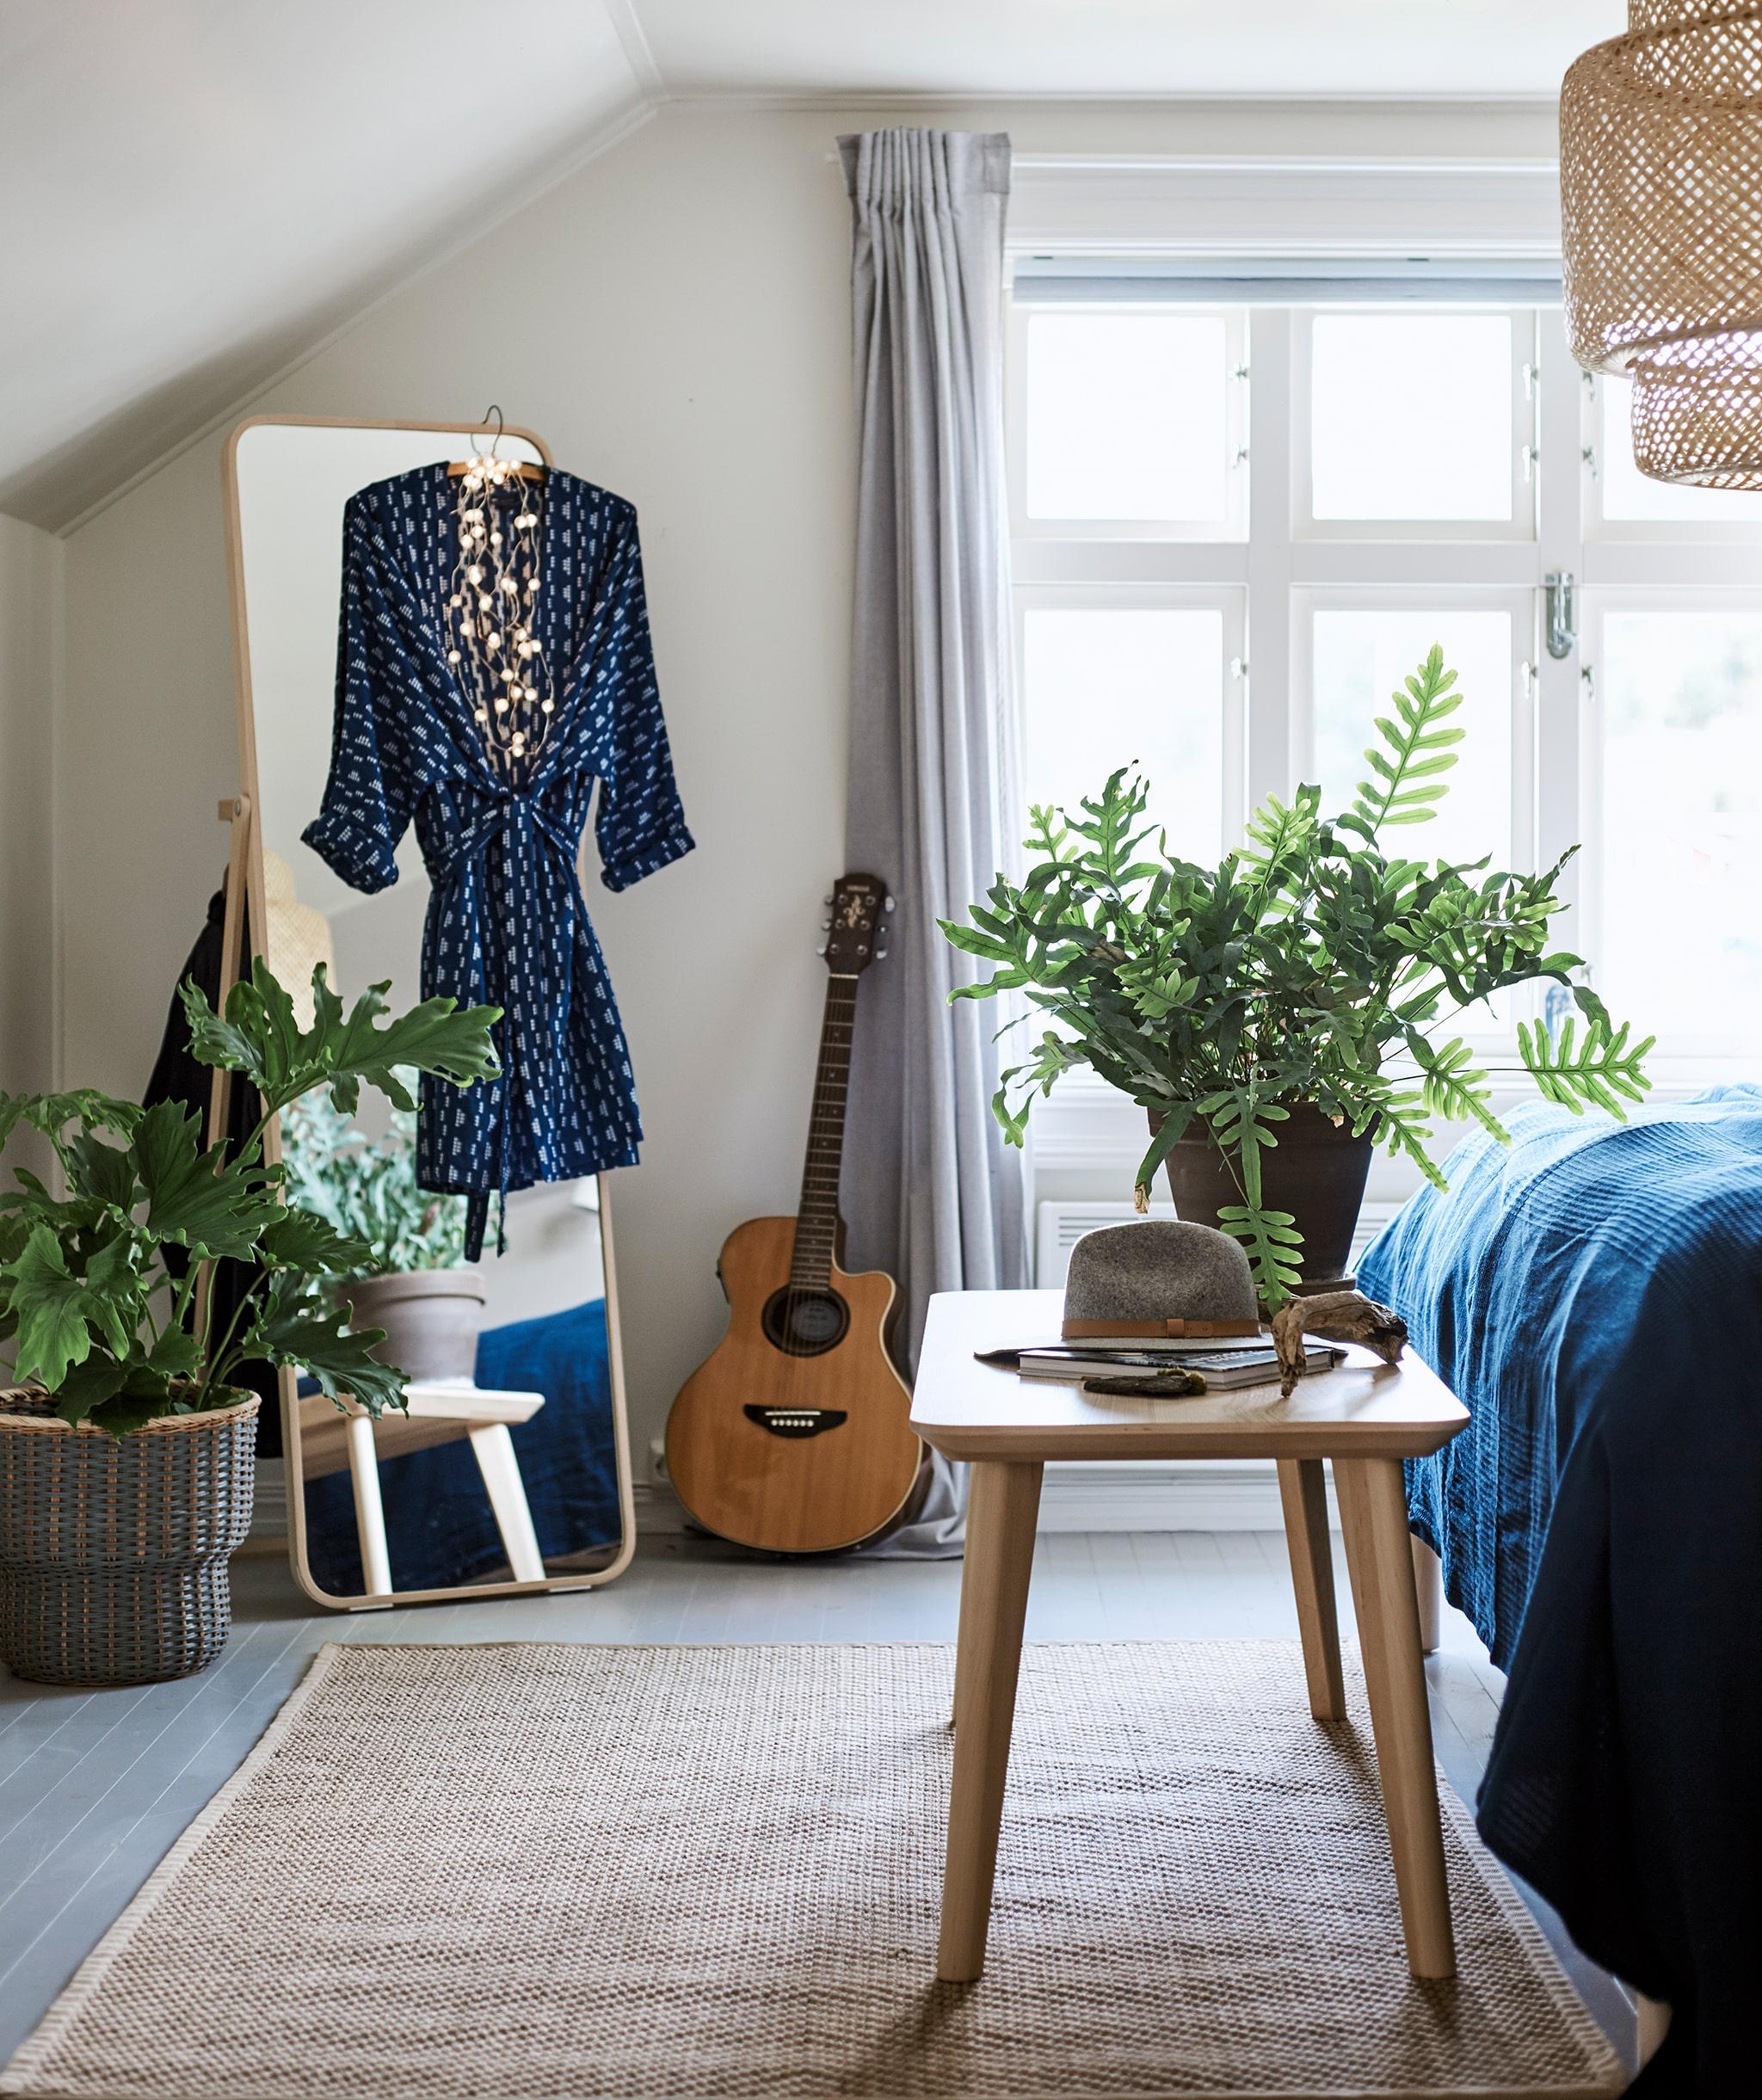 Kamar tidur dengan lampu plafon dan karpet, cermin dengan gaun yang tergantung di atasnya serta bangku di ujung tempat tidur.